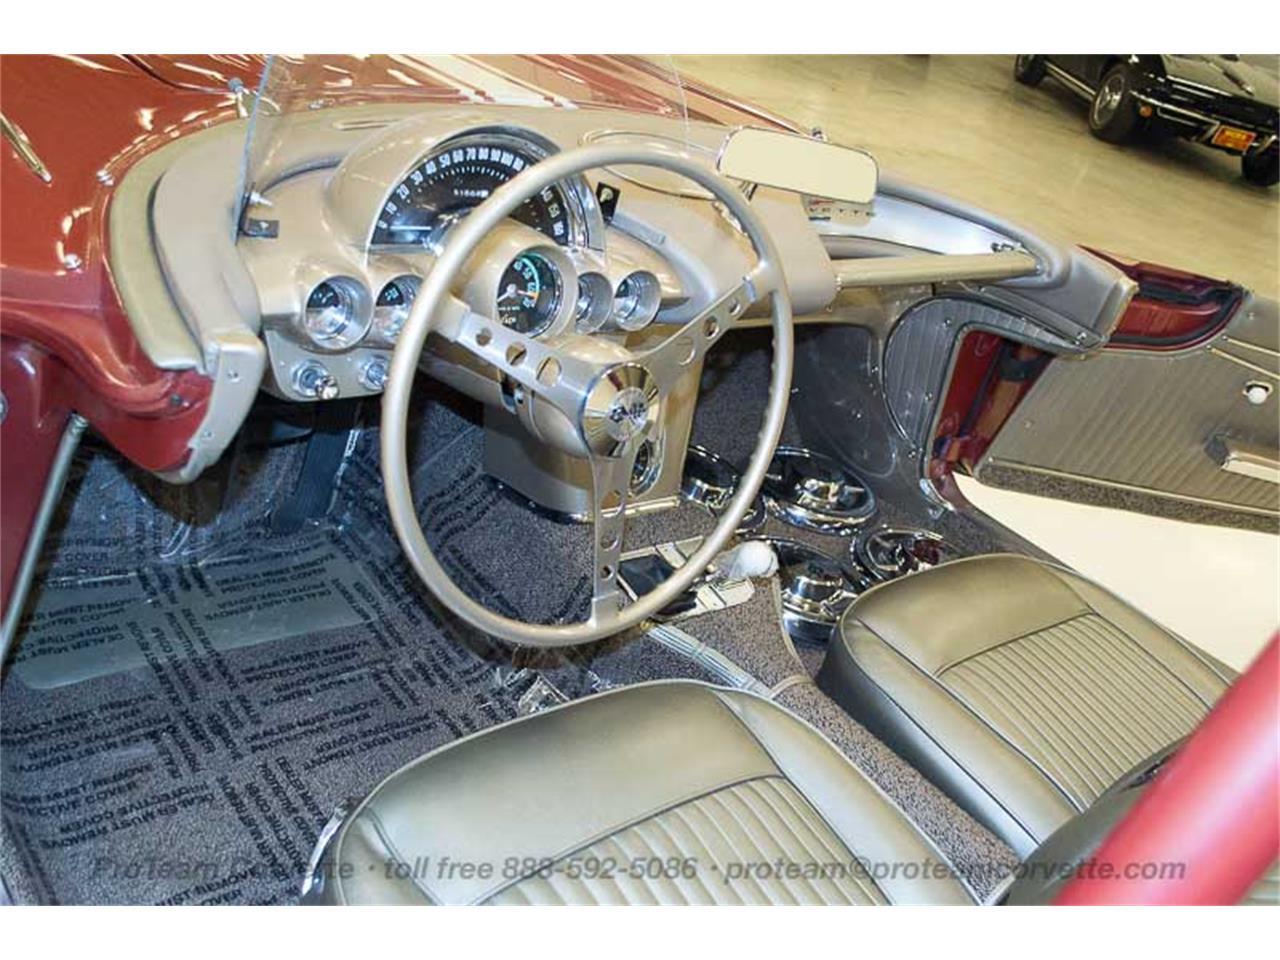 Large Picture of Classic 1962 Chevrolet Corvette located in Napoleon Ohio - $300,000.00 - JBG4